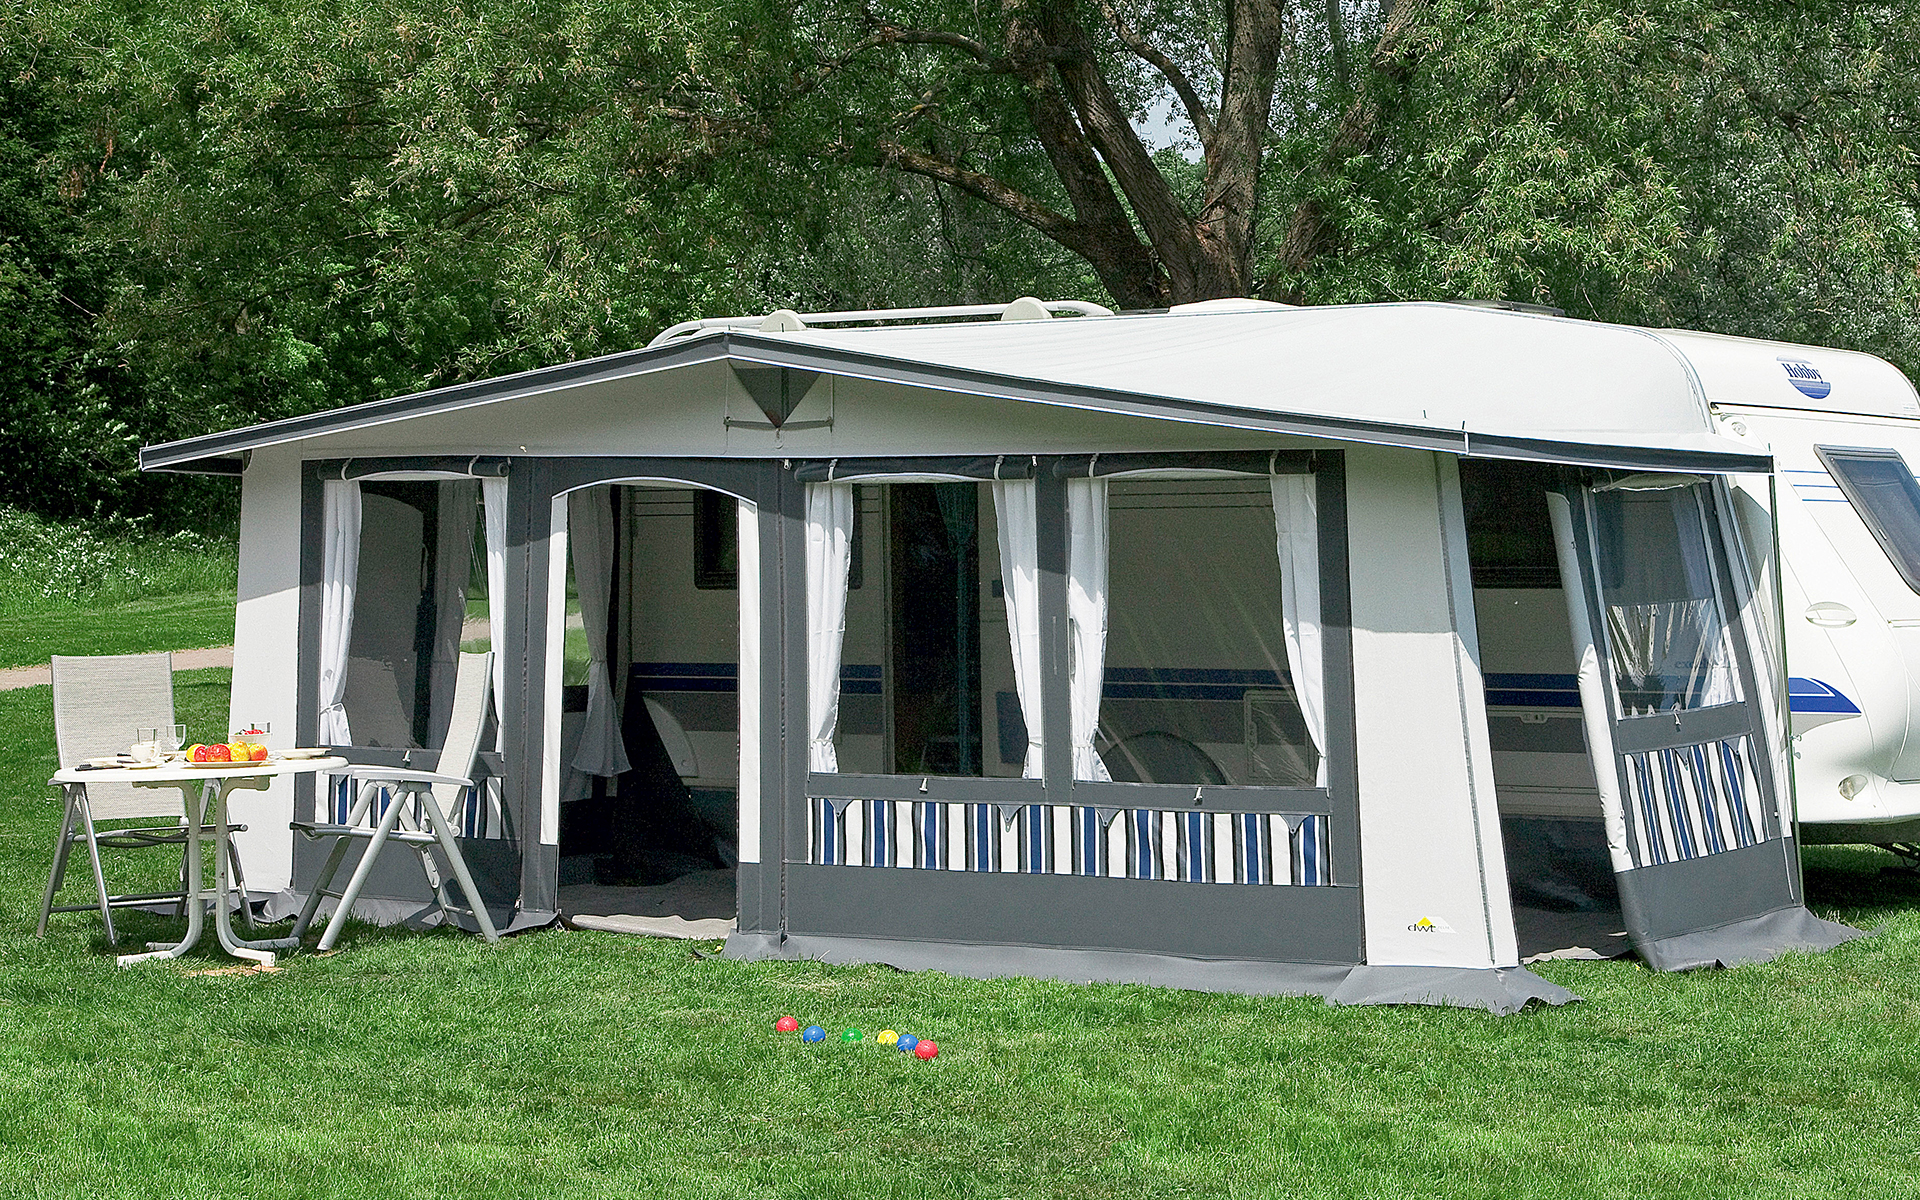 eriskirch fritz berger campingbedarf. Black Bedroom Furniture Sets. Home Design Ideas